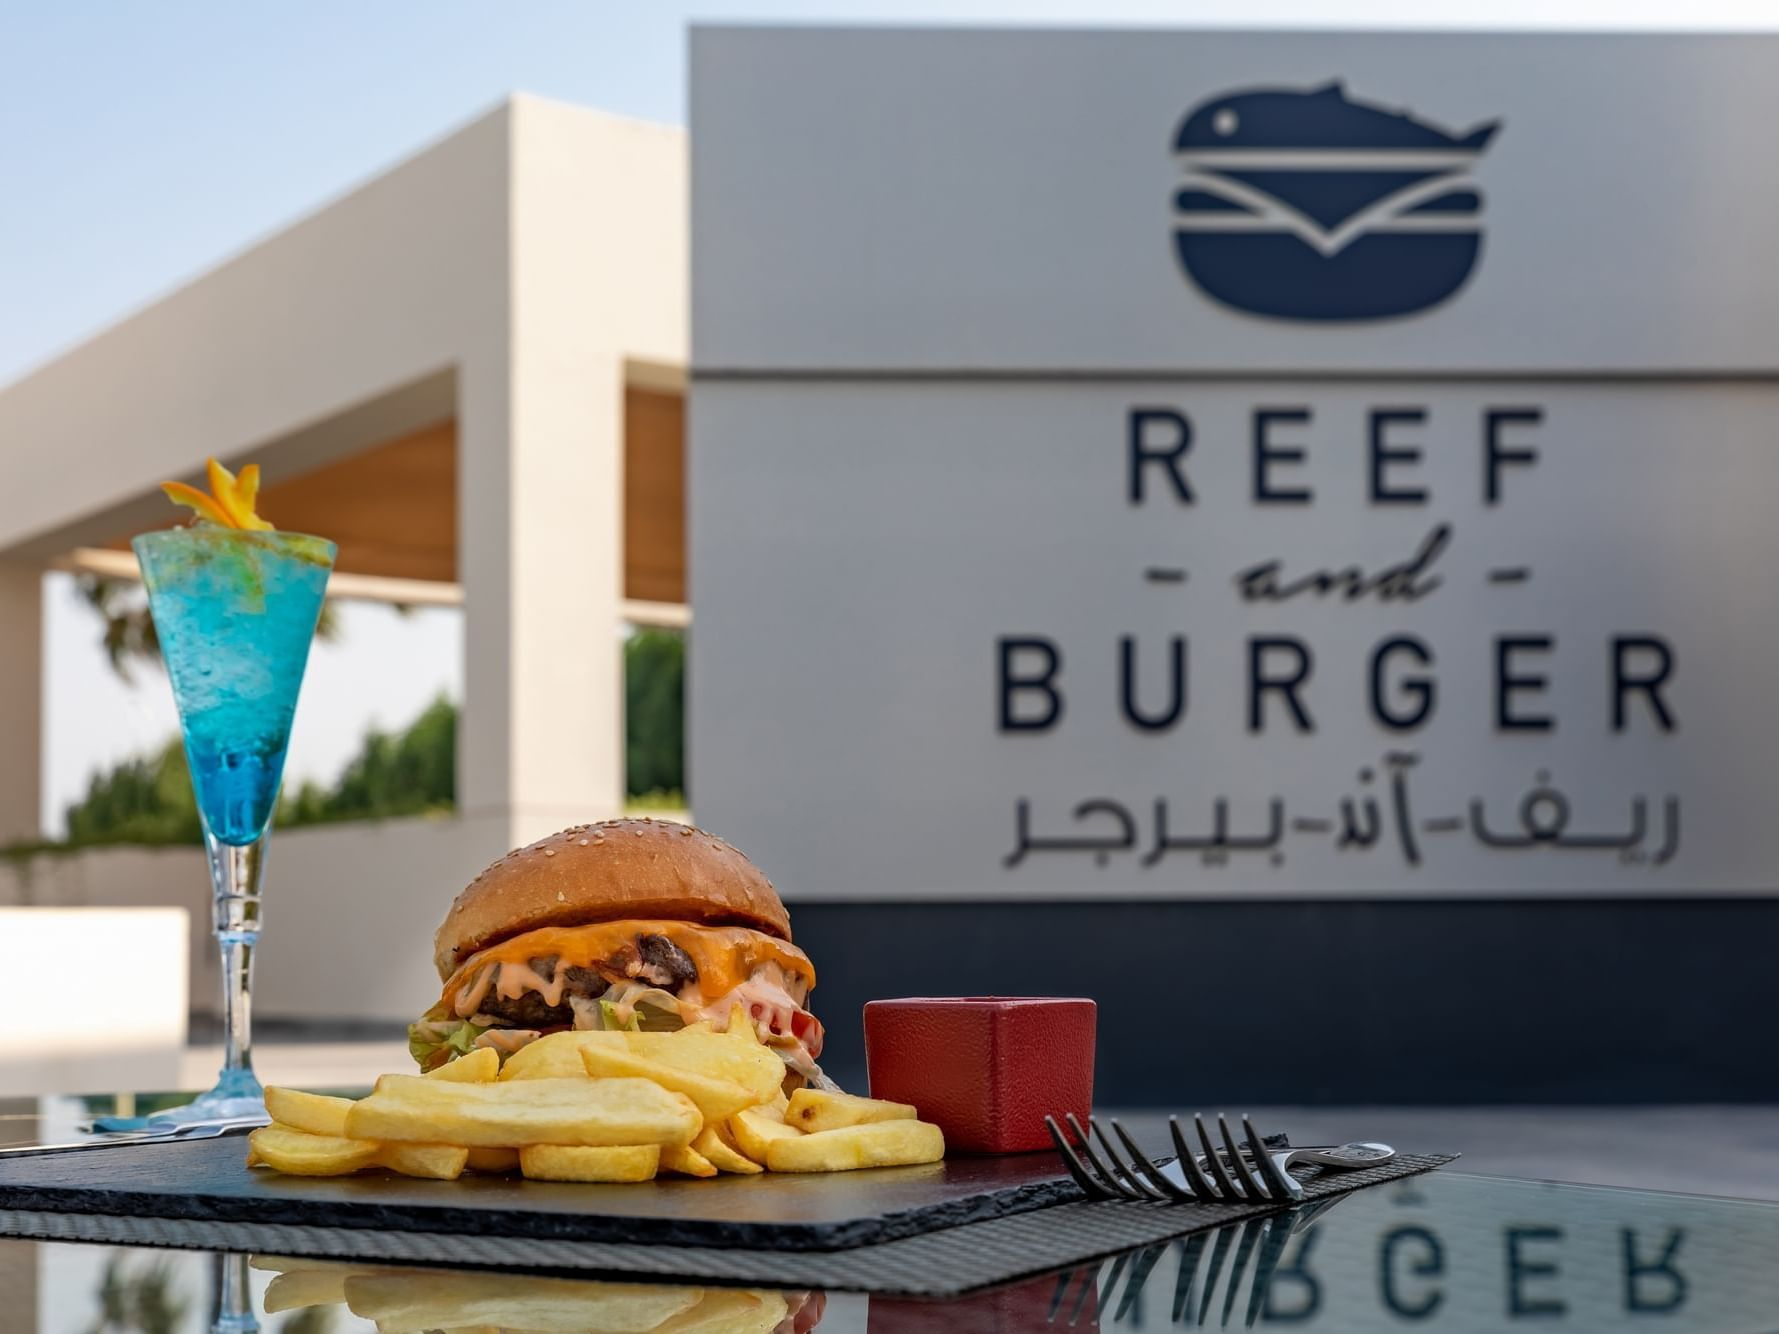 REEF & BURGER in Sealine Beach Resort